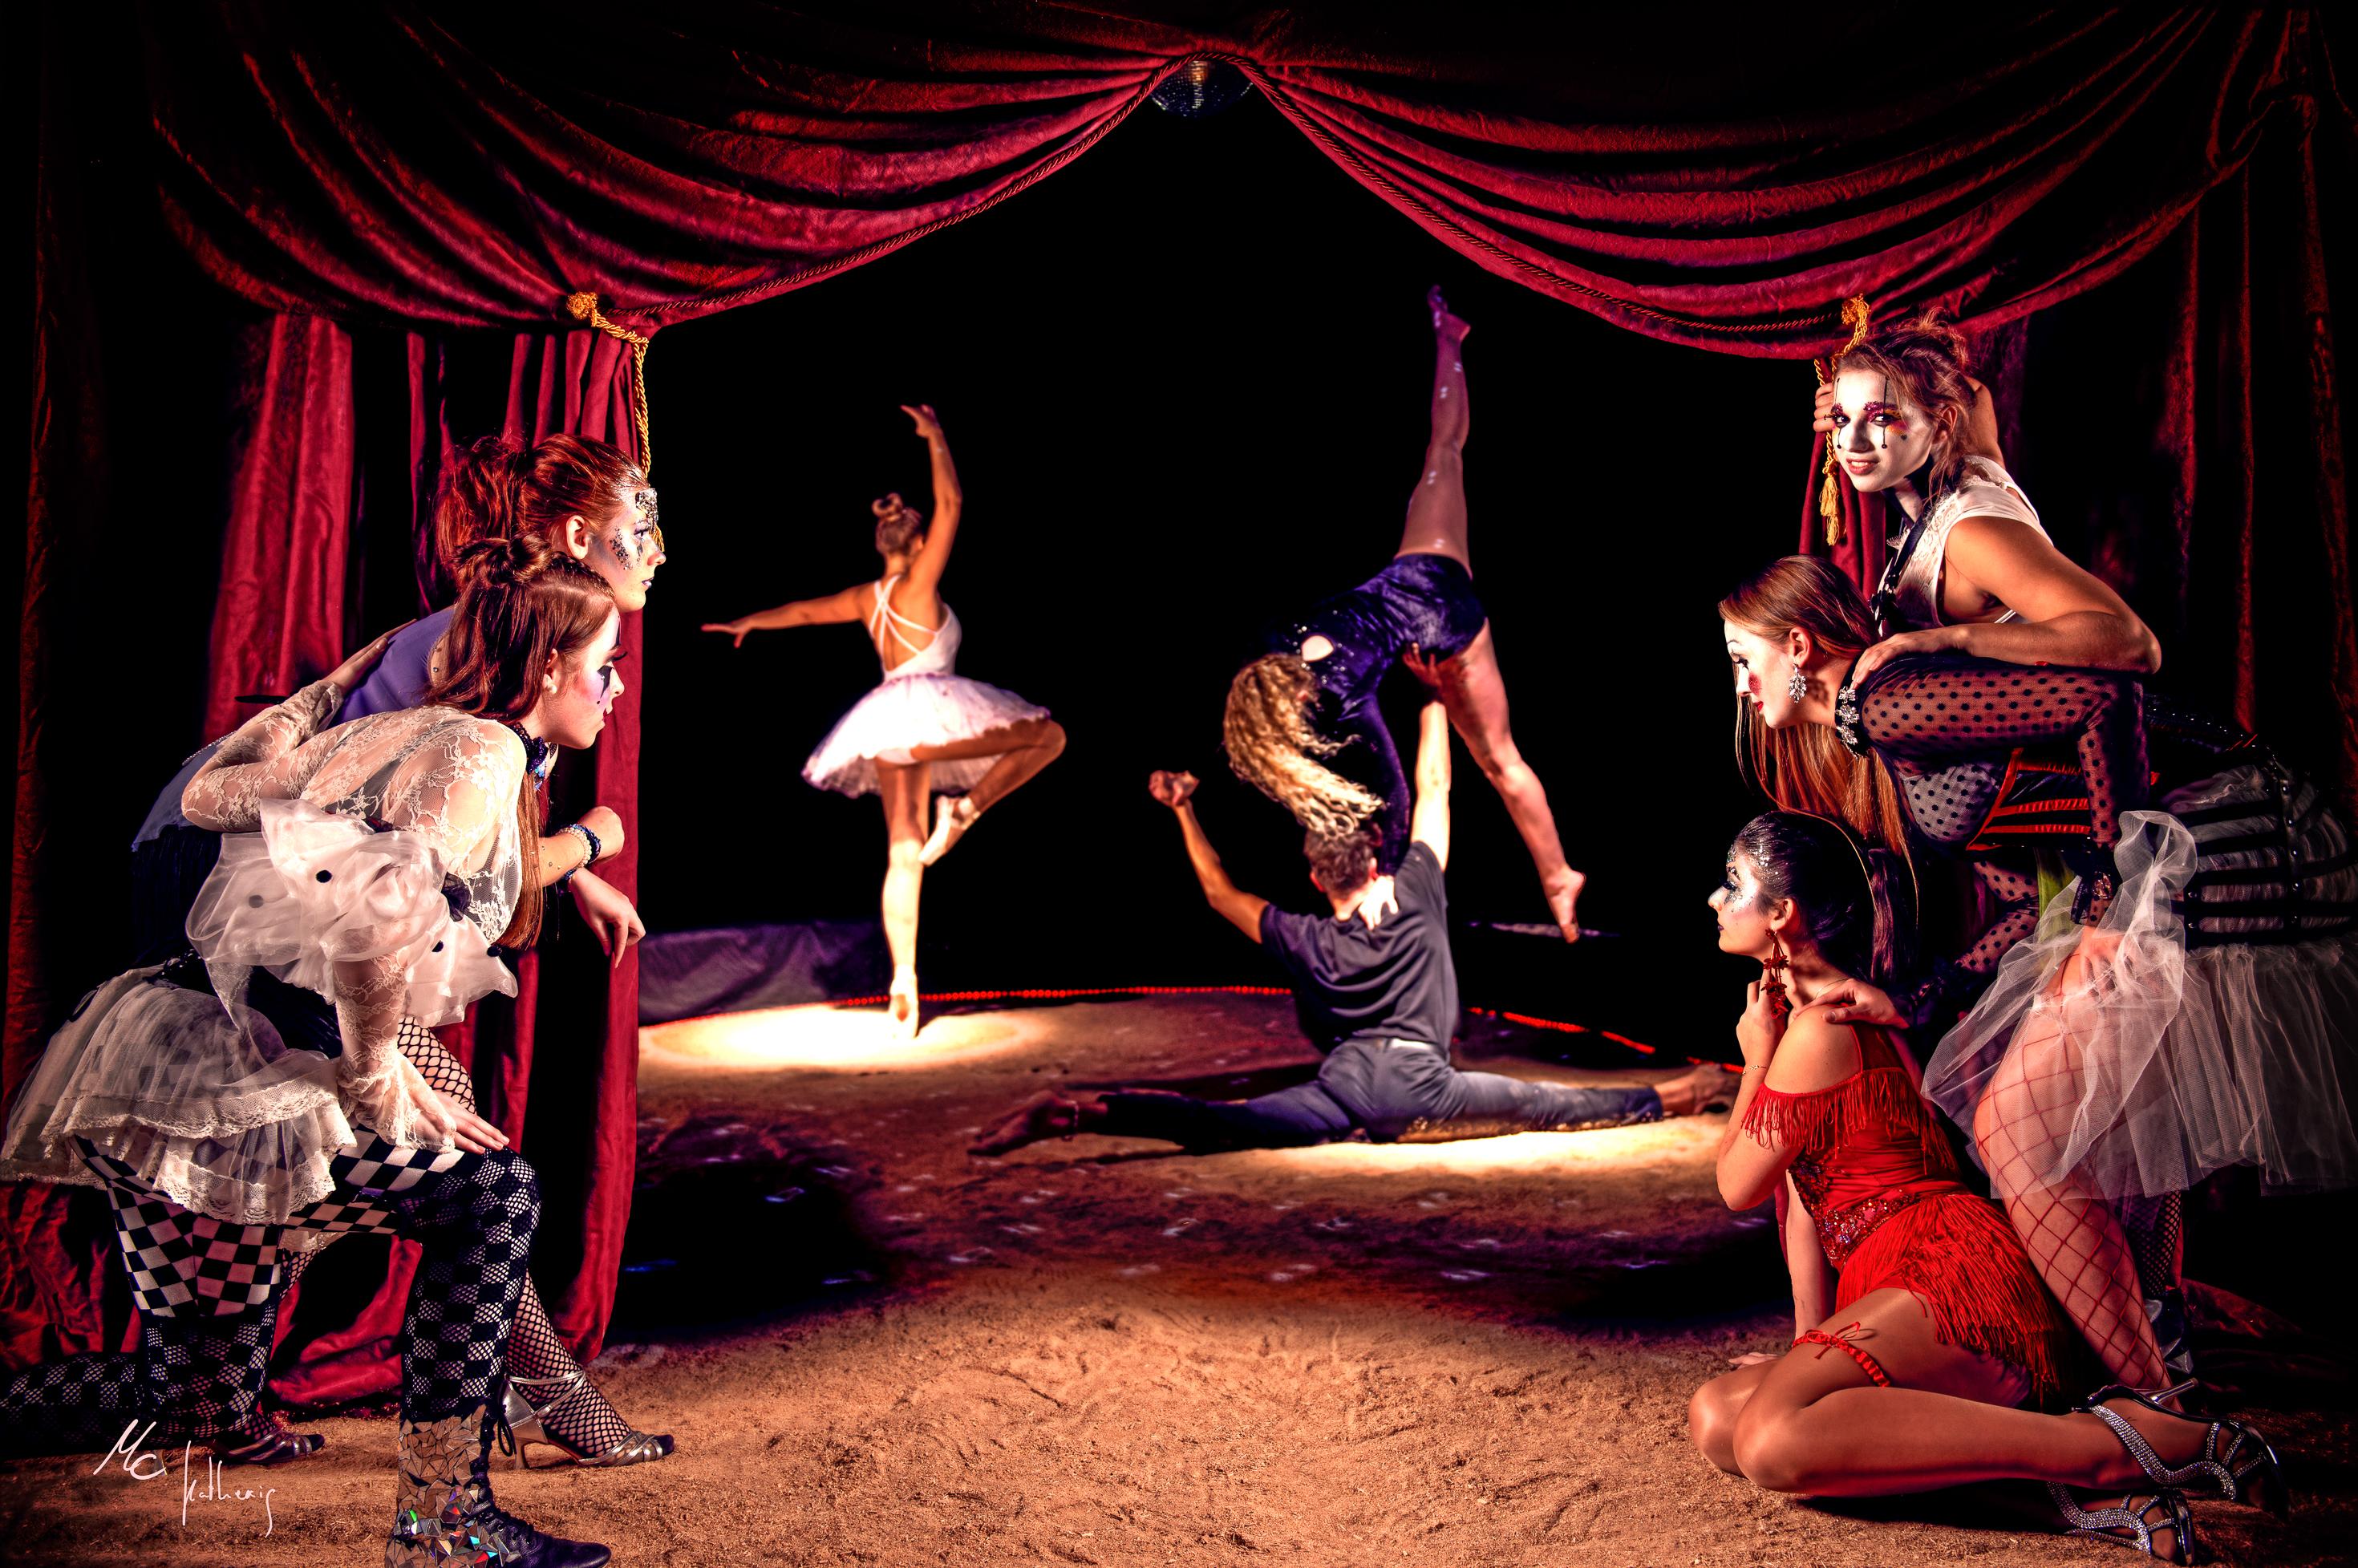 Titelbild-Dance-Meets-Circus